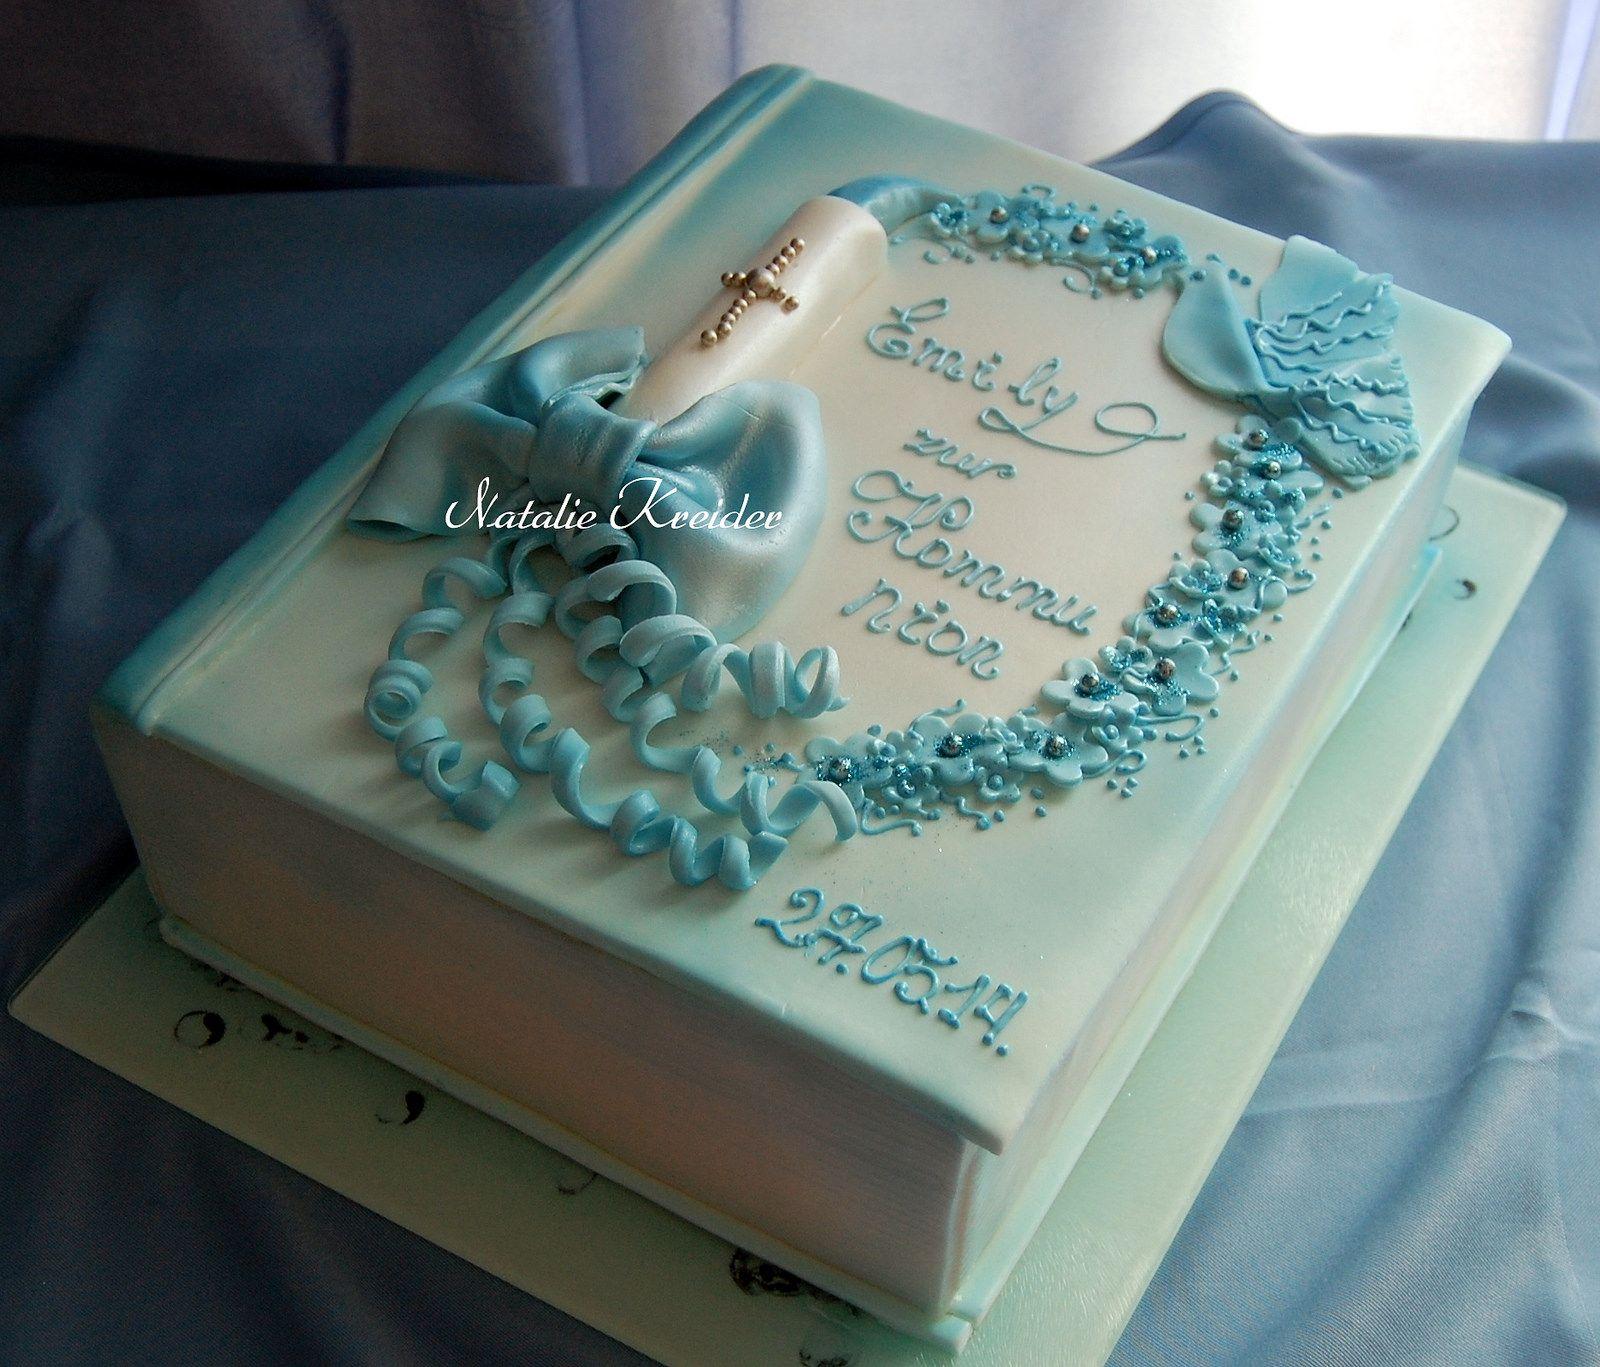 Christening Cake Book Design : ??????????? 2199 Bible cake, Bible and Cake